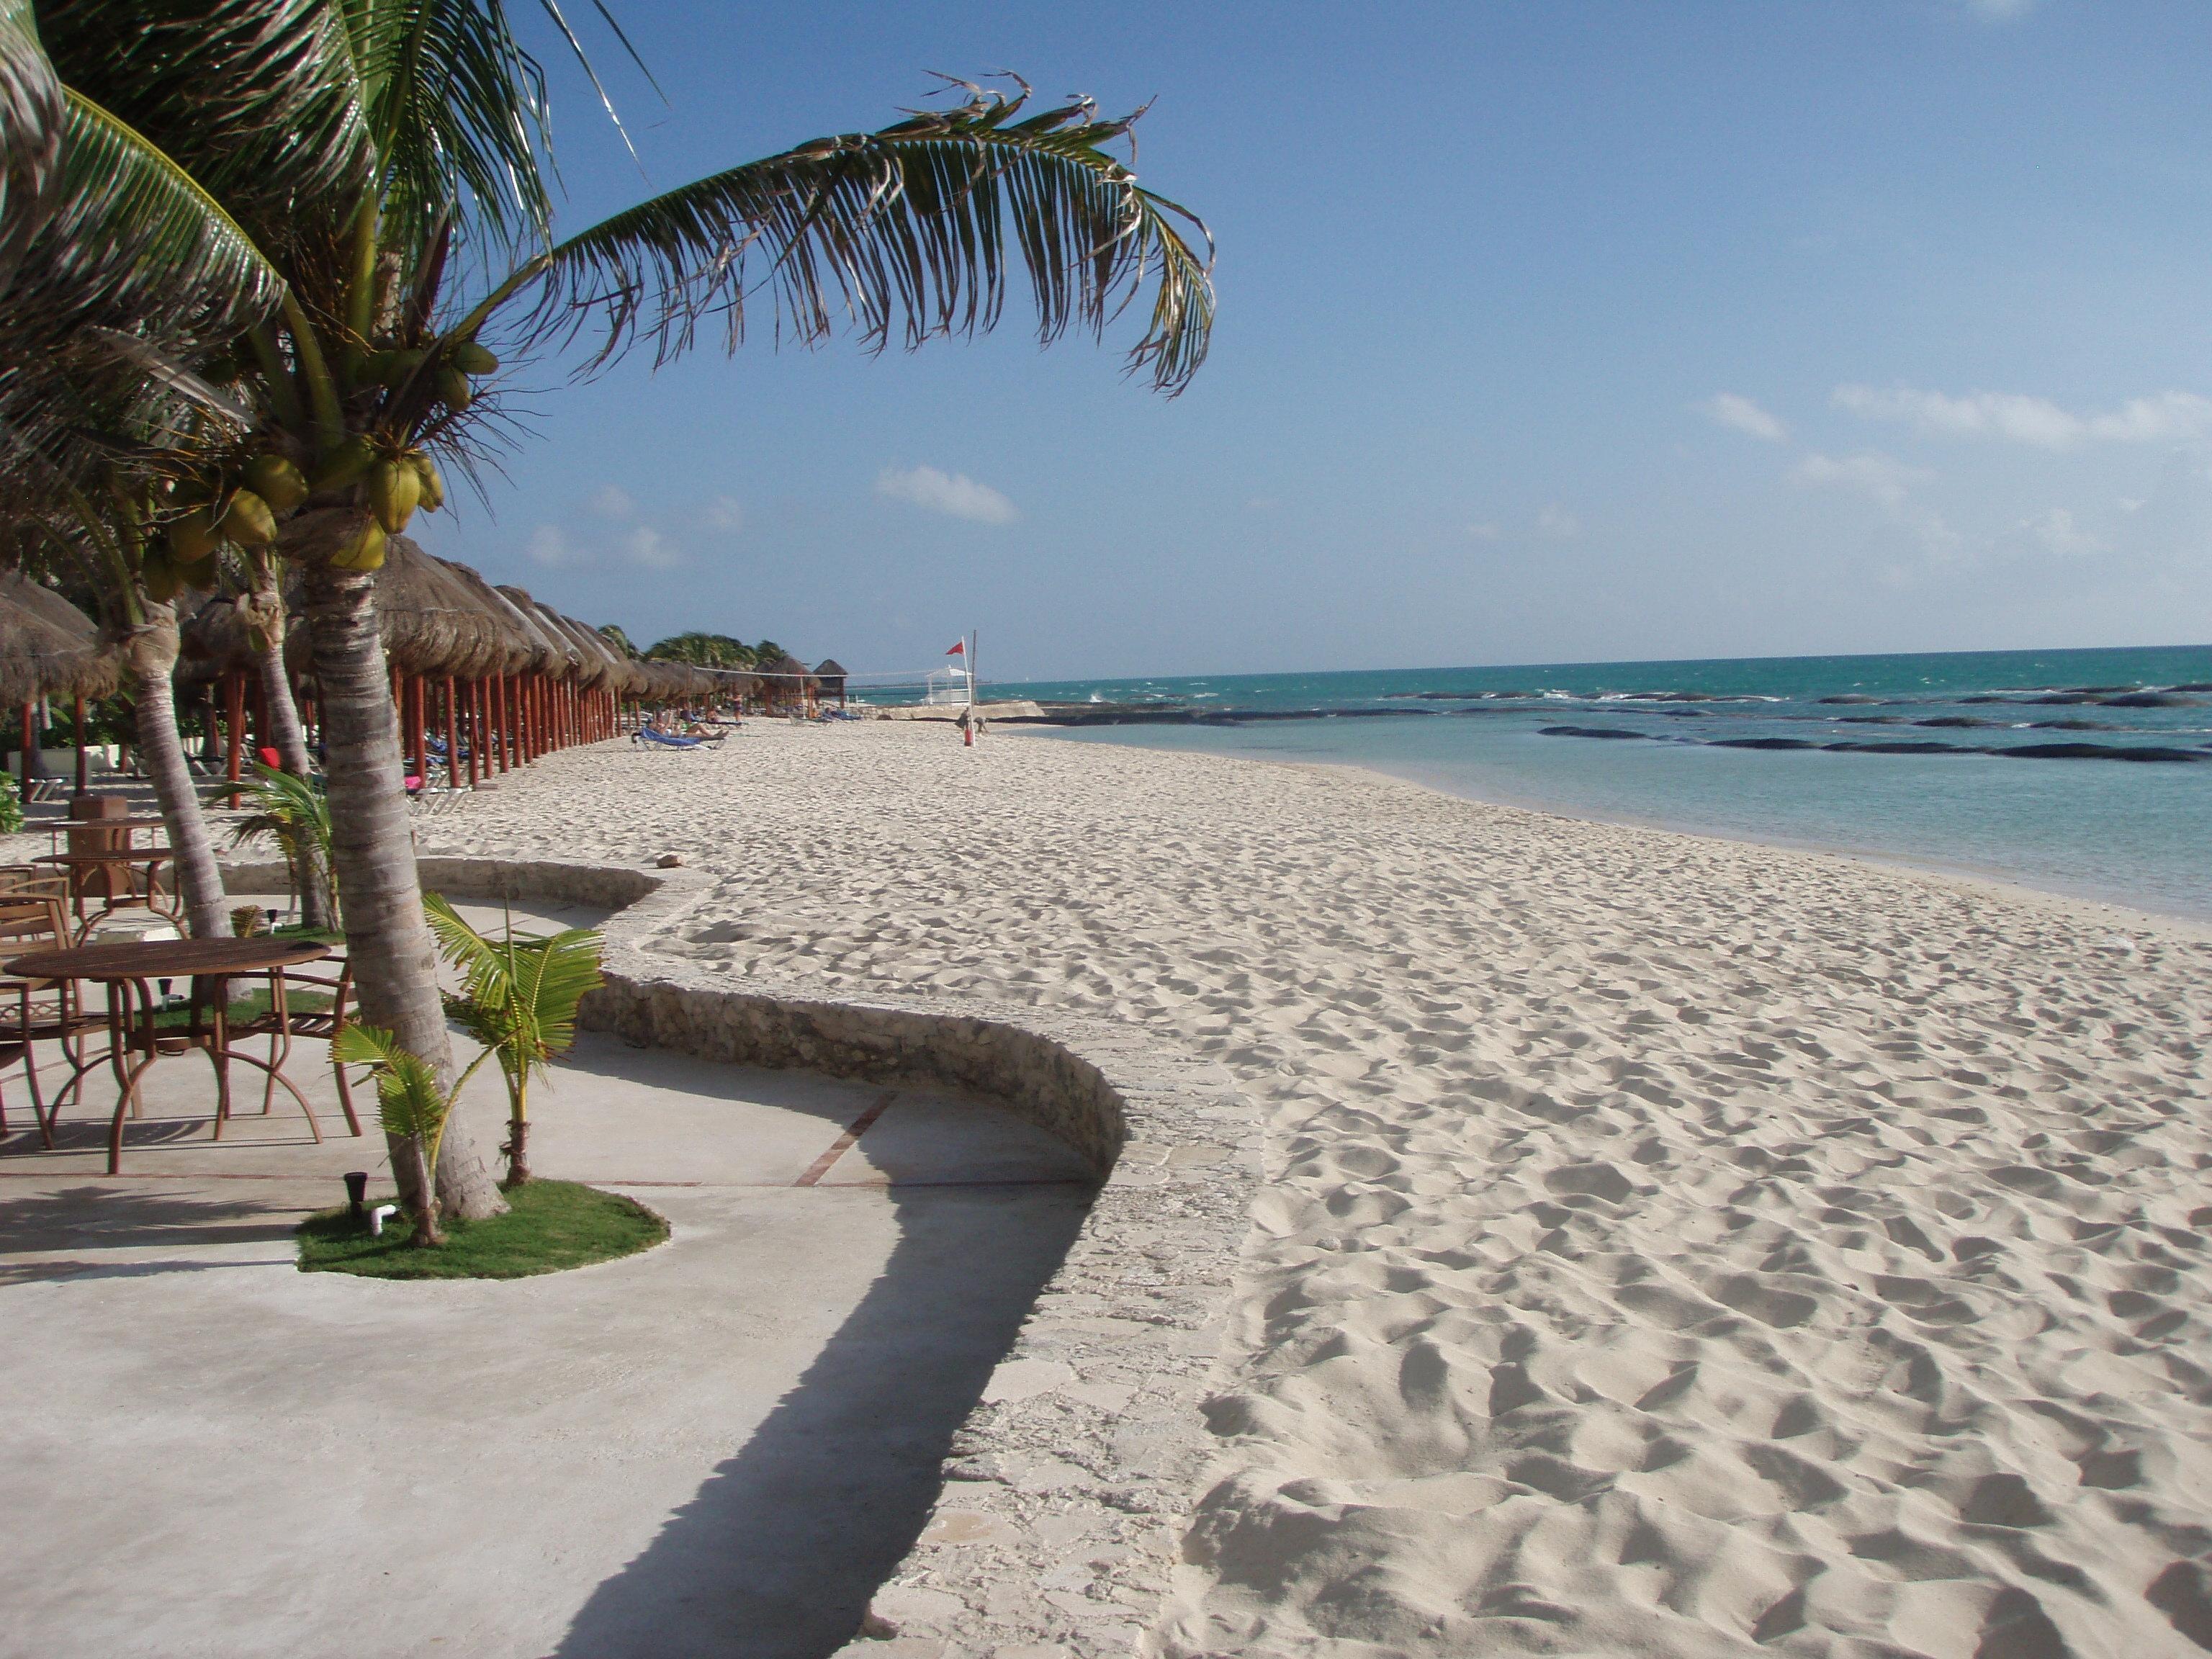 El Dorado Beach Resort Mexico | The best beaches in the world